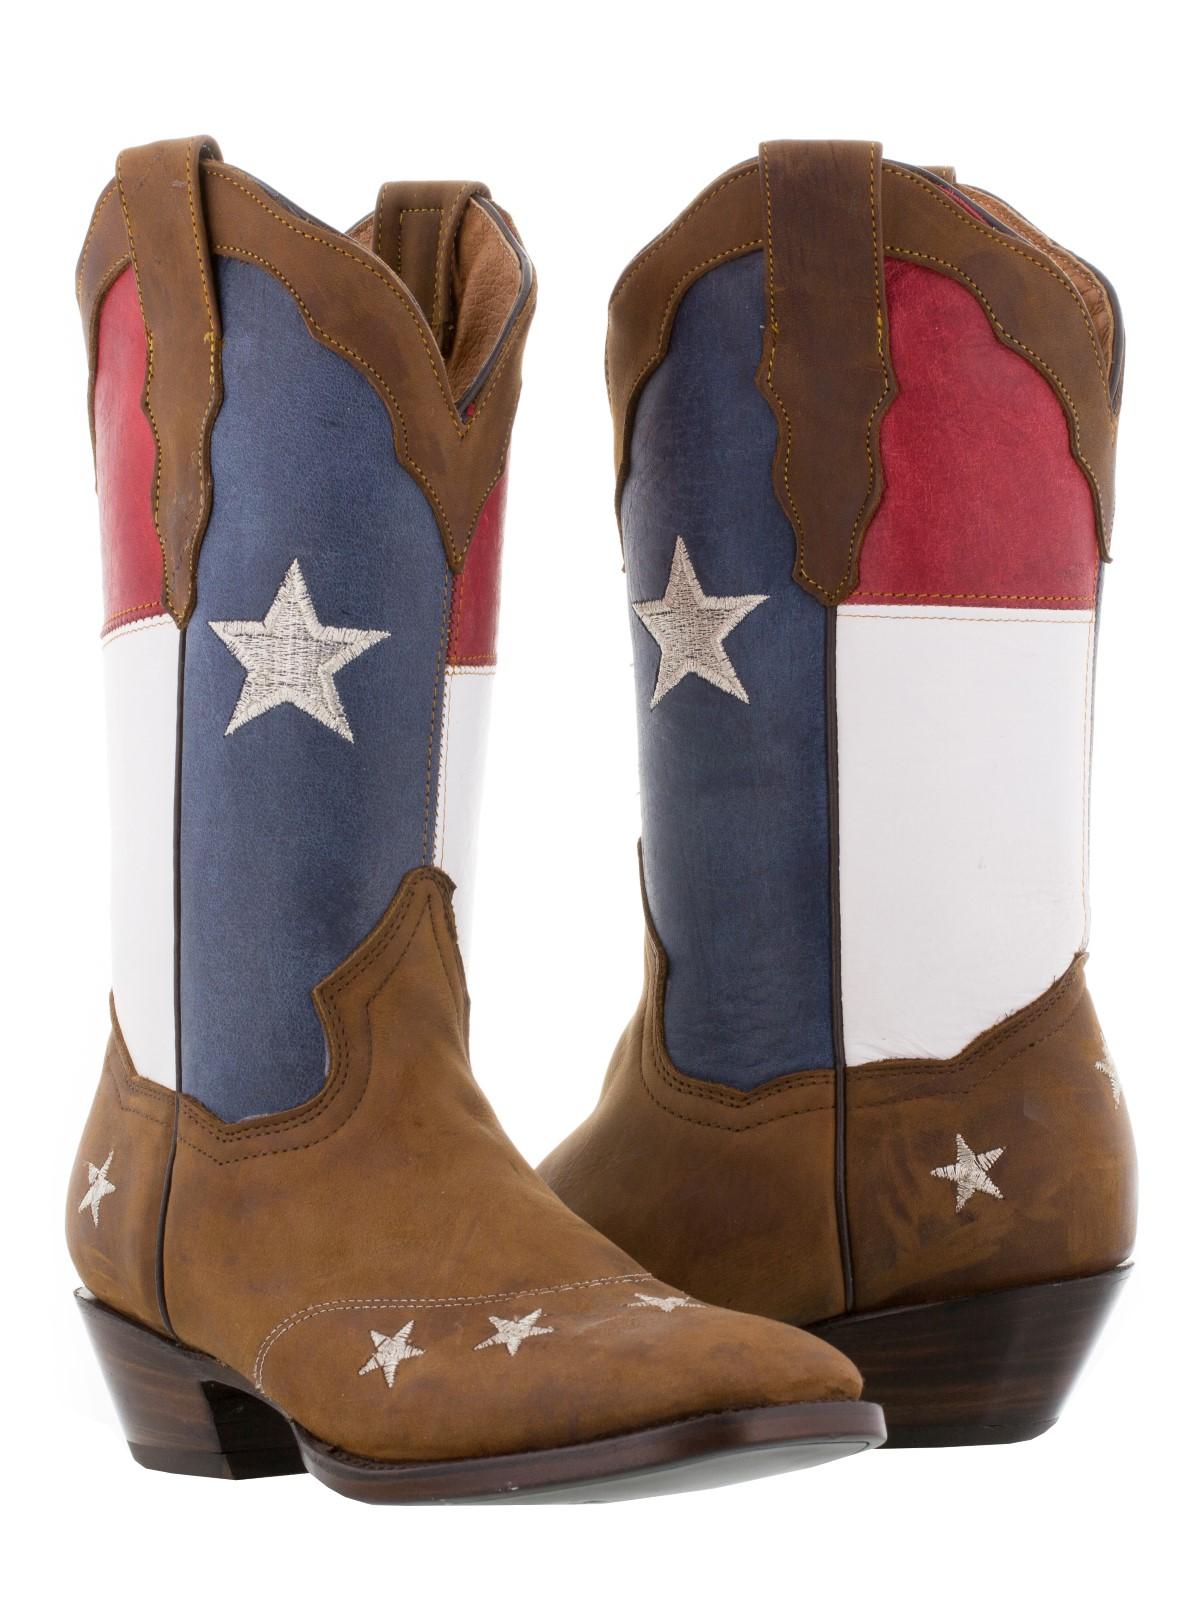 Luxury Gameday Boots Womenu0026#39;s 10u0026quot; Short Leather Texas Au0026M Cowboy Boots - Walmart.com